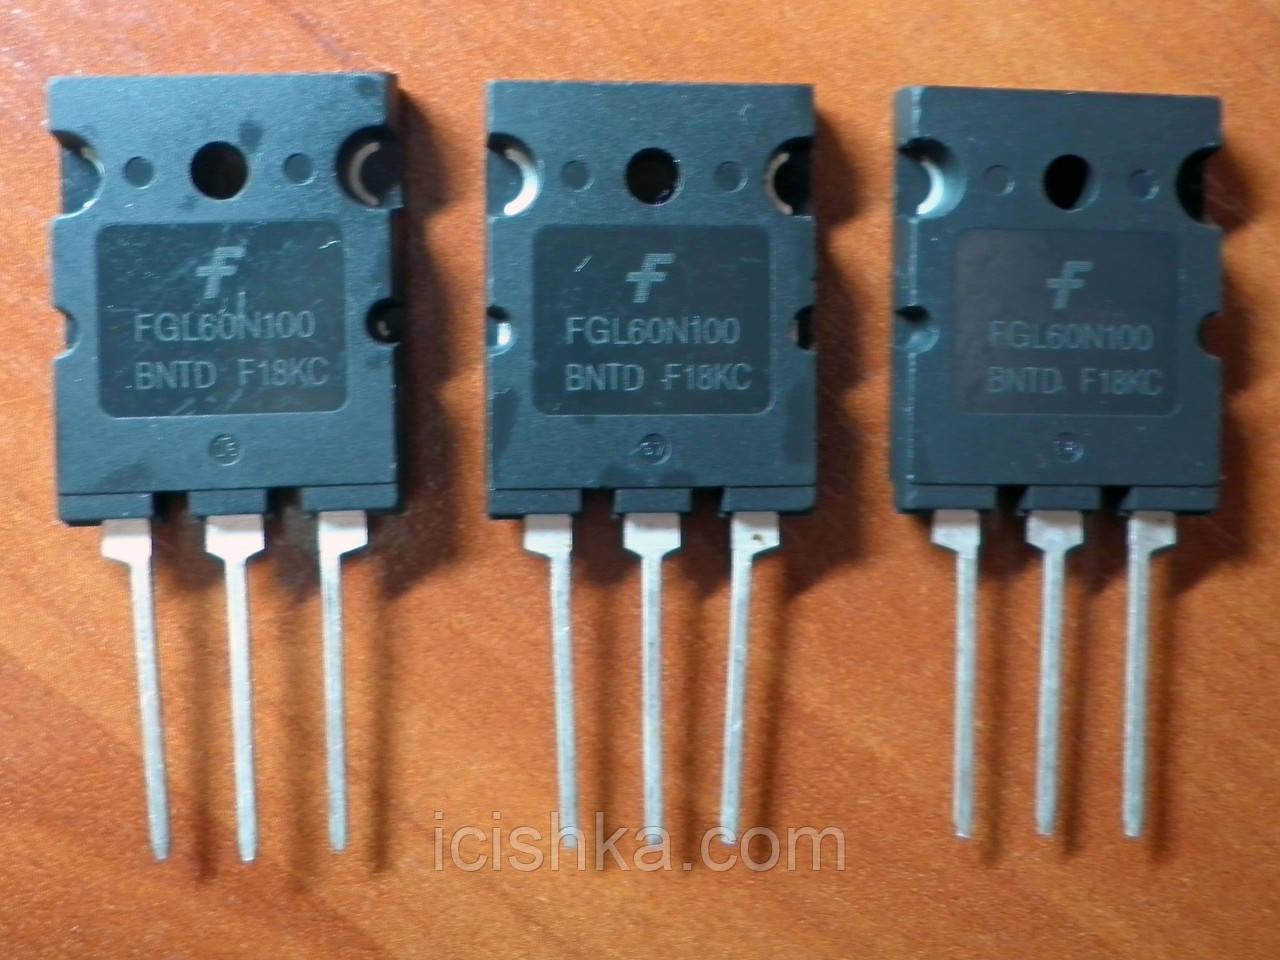 FGL60N100BNTD TO-264 3L - 1000V 60A NPT IGBT транзистор